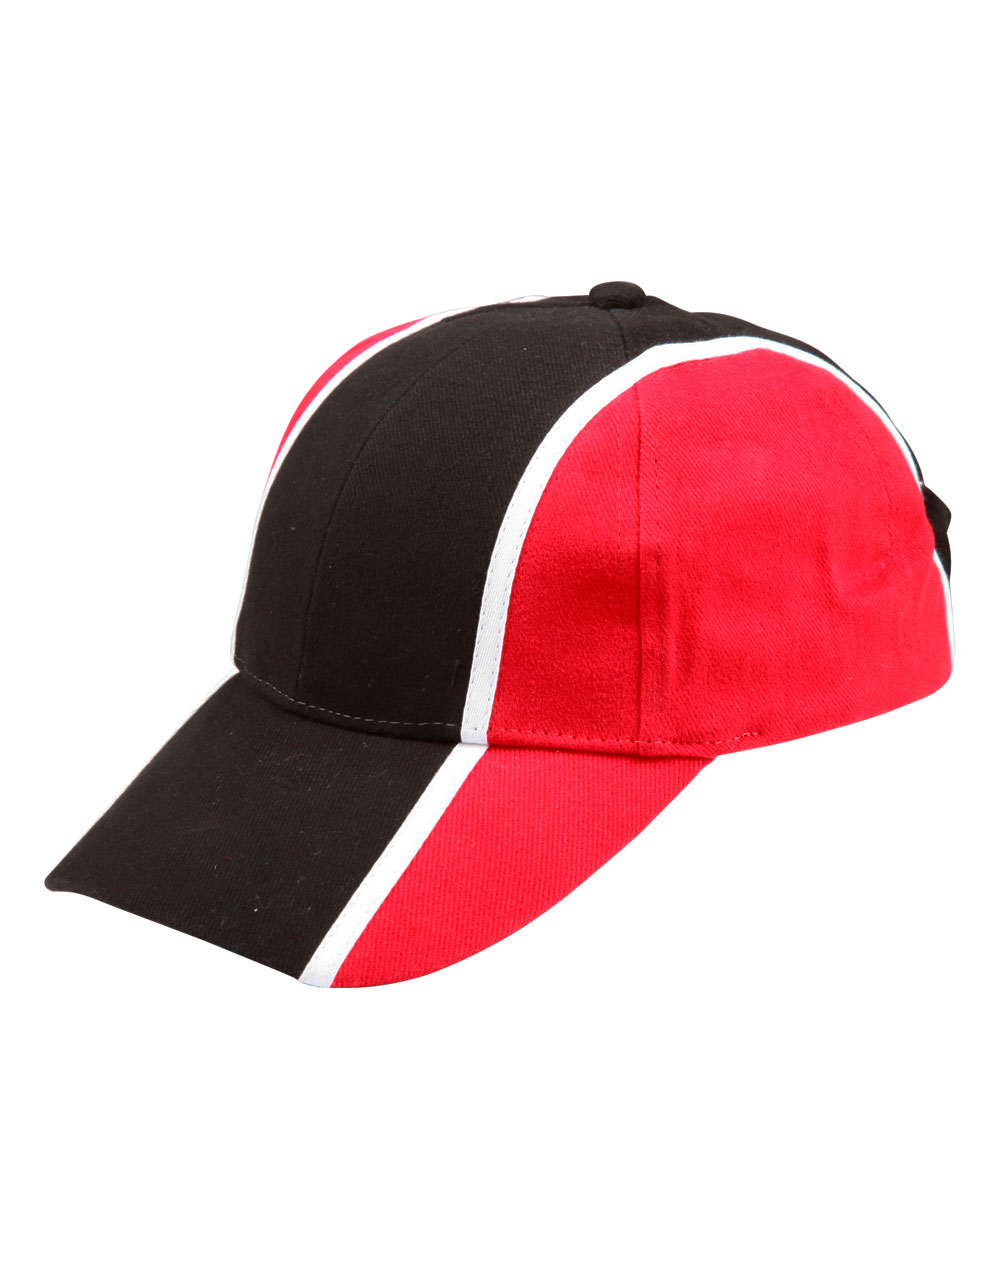 https://s3-ap-southeast-1.amazonaws.com/ws-imgs/CAPS/CH83_Black.White.Red_ThreeQtr.jpg